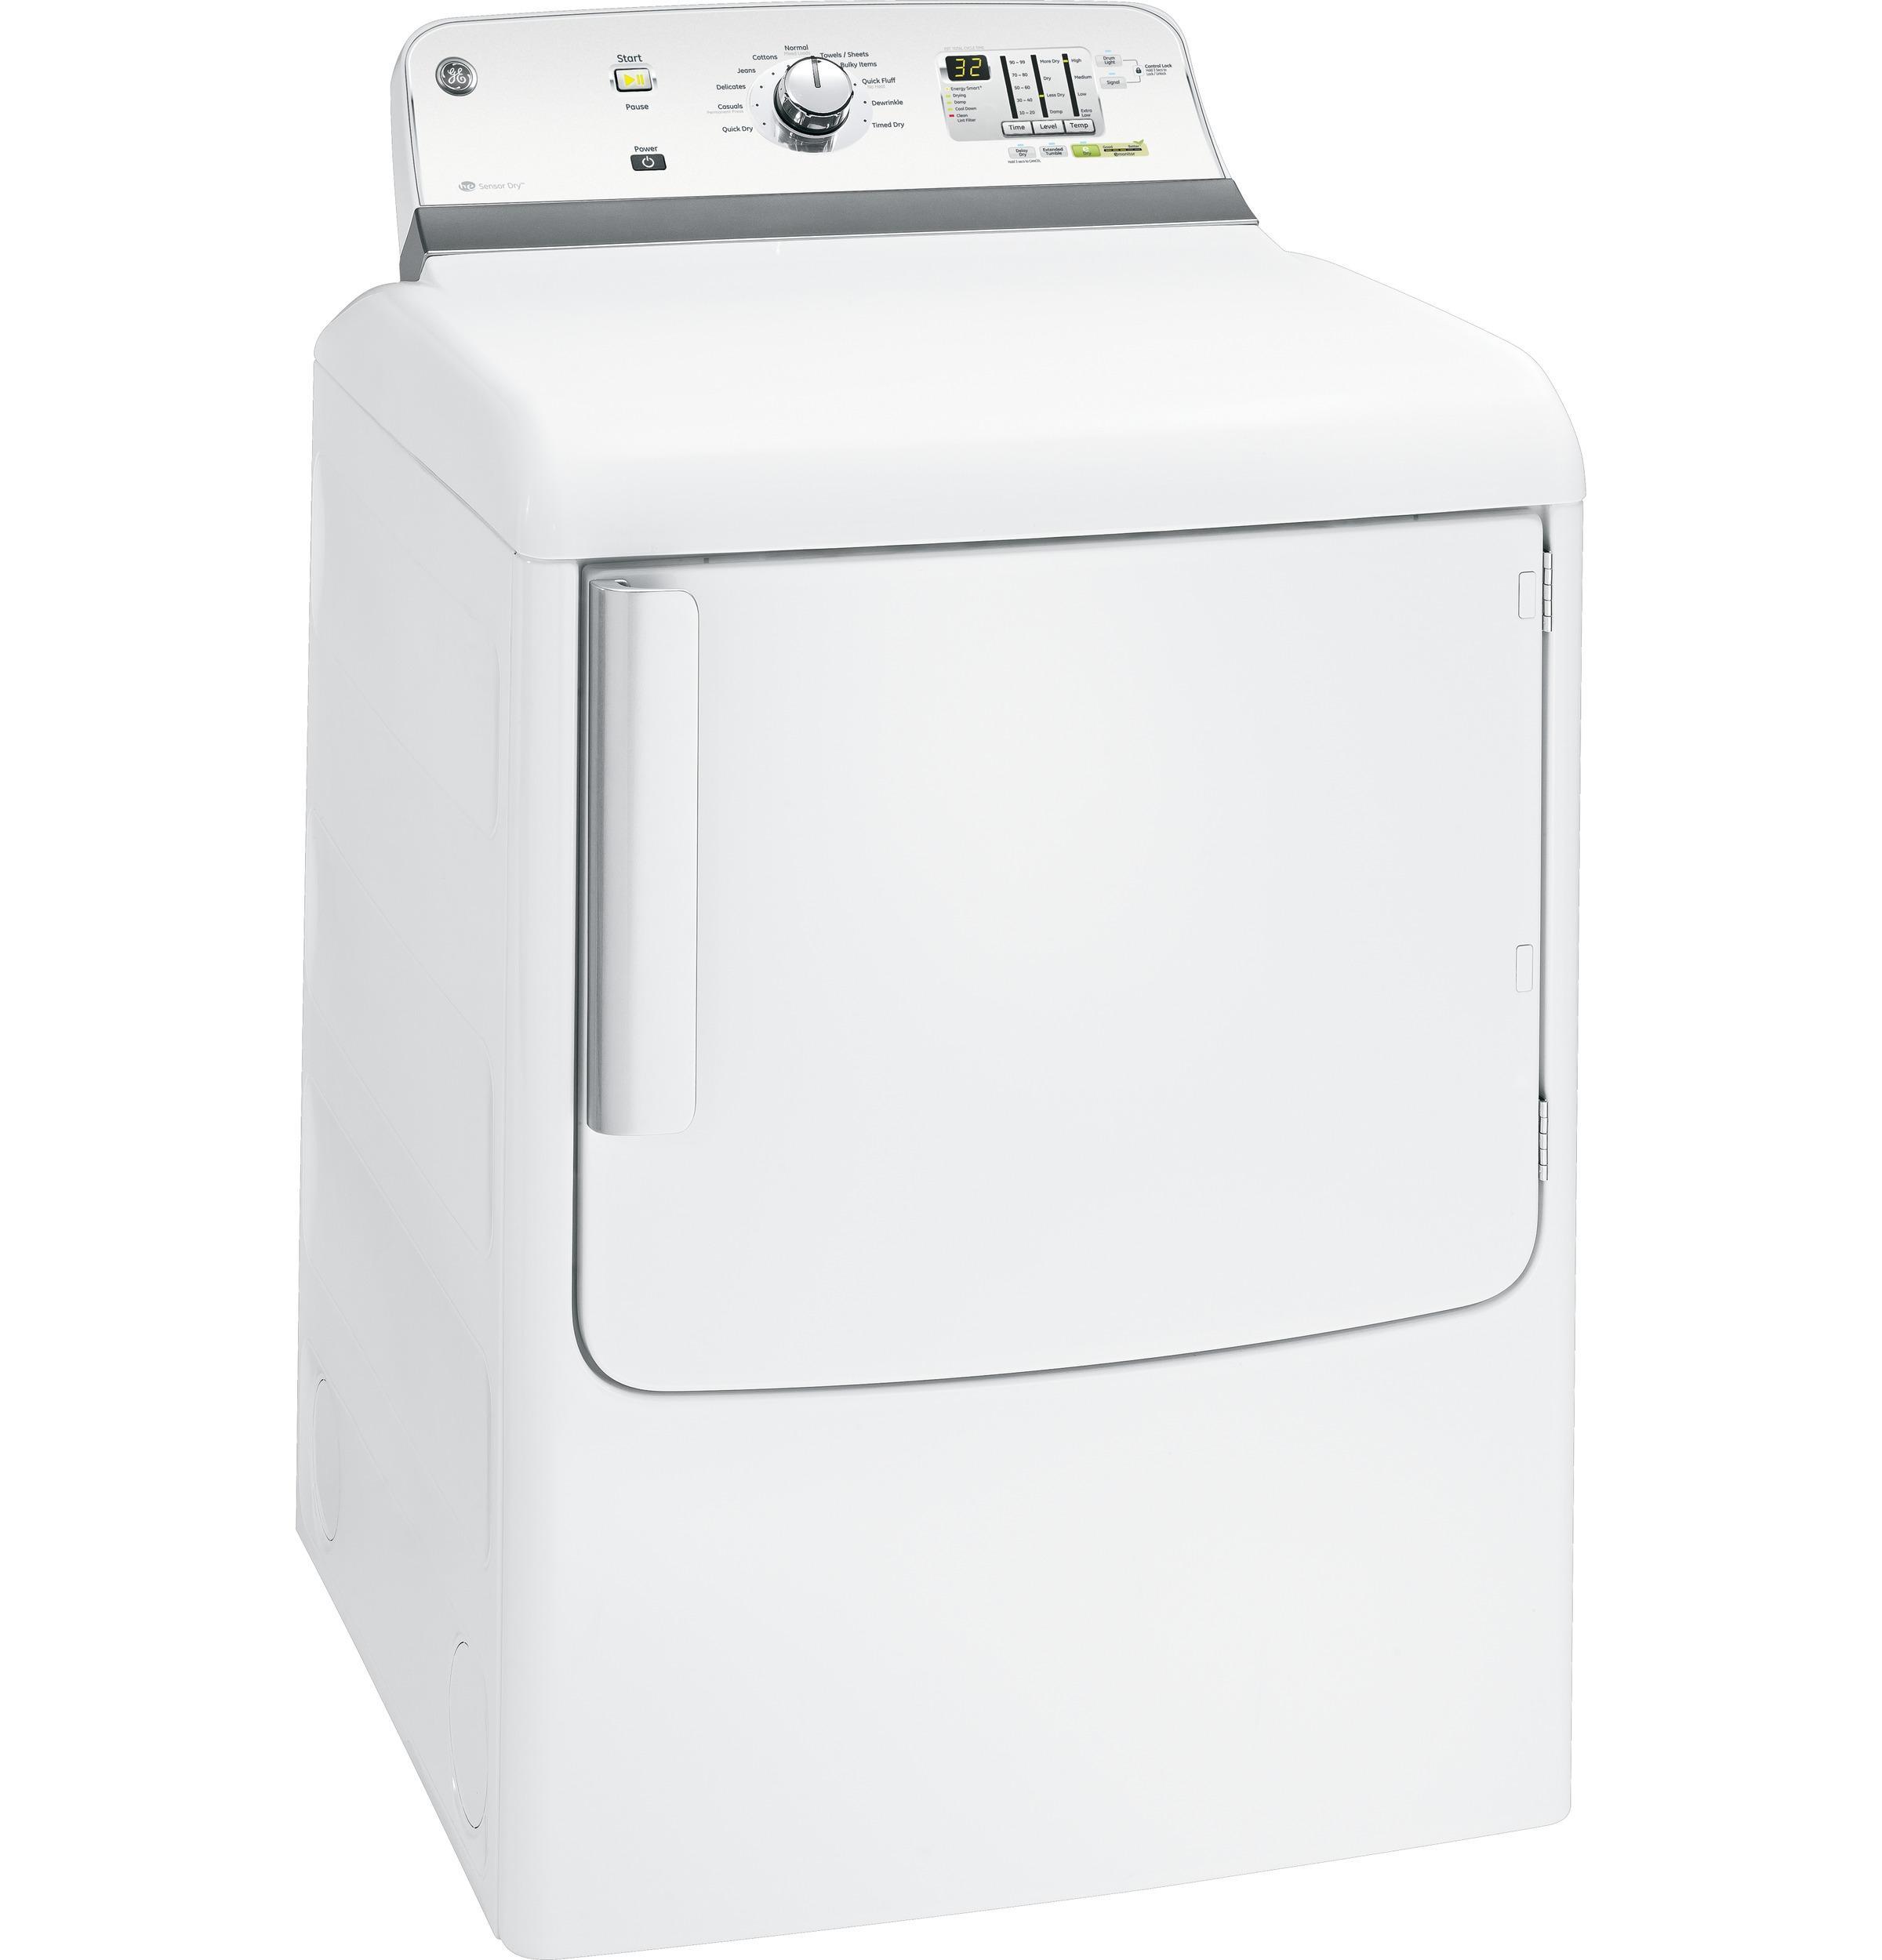 Gtdl740gdww General Electric Gtdl740gdww Gas Dryers White